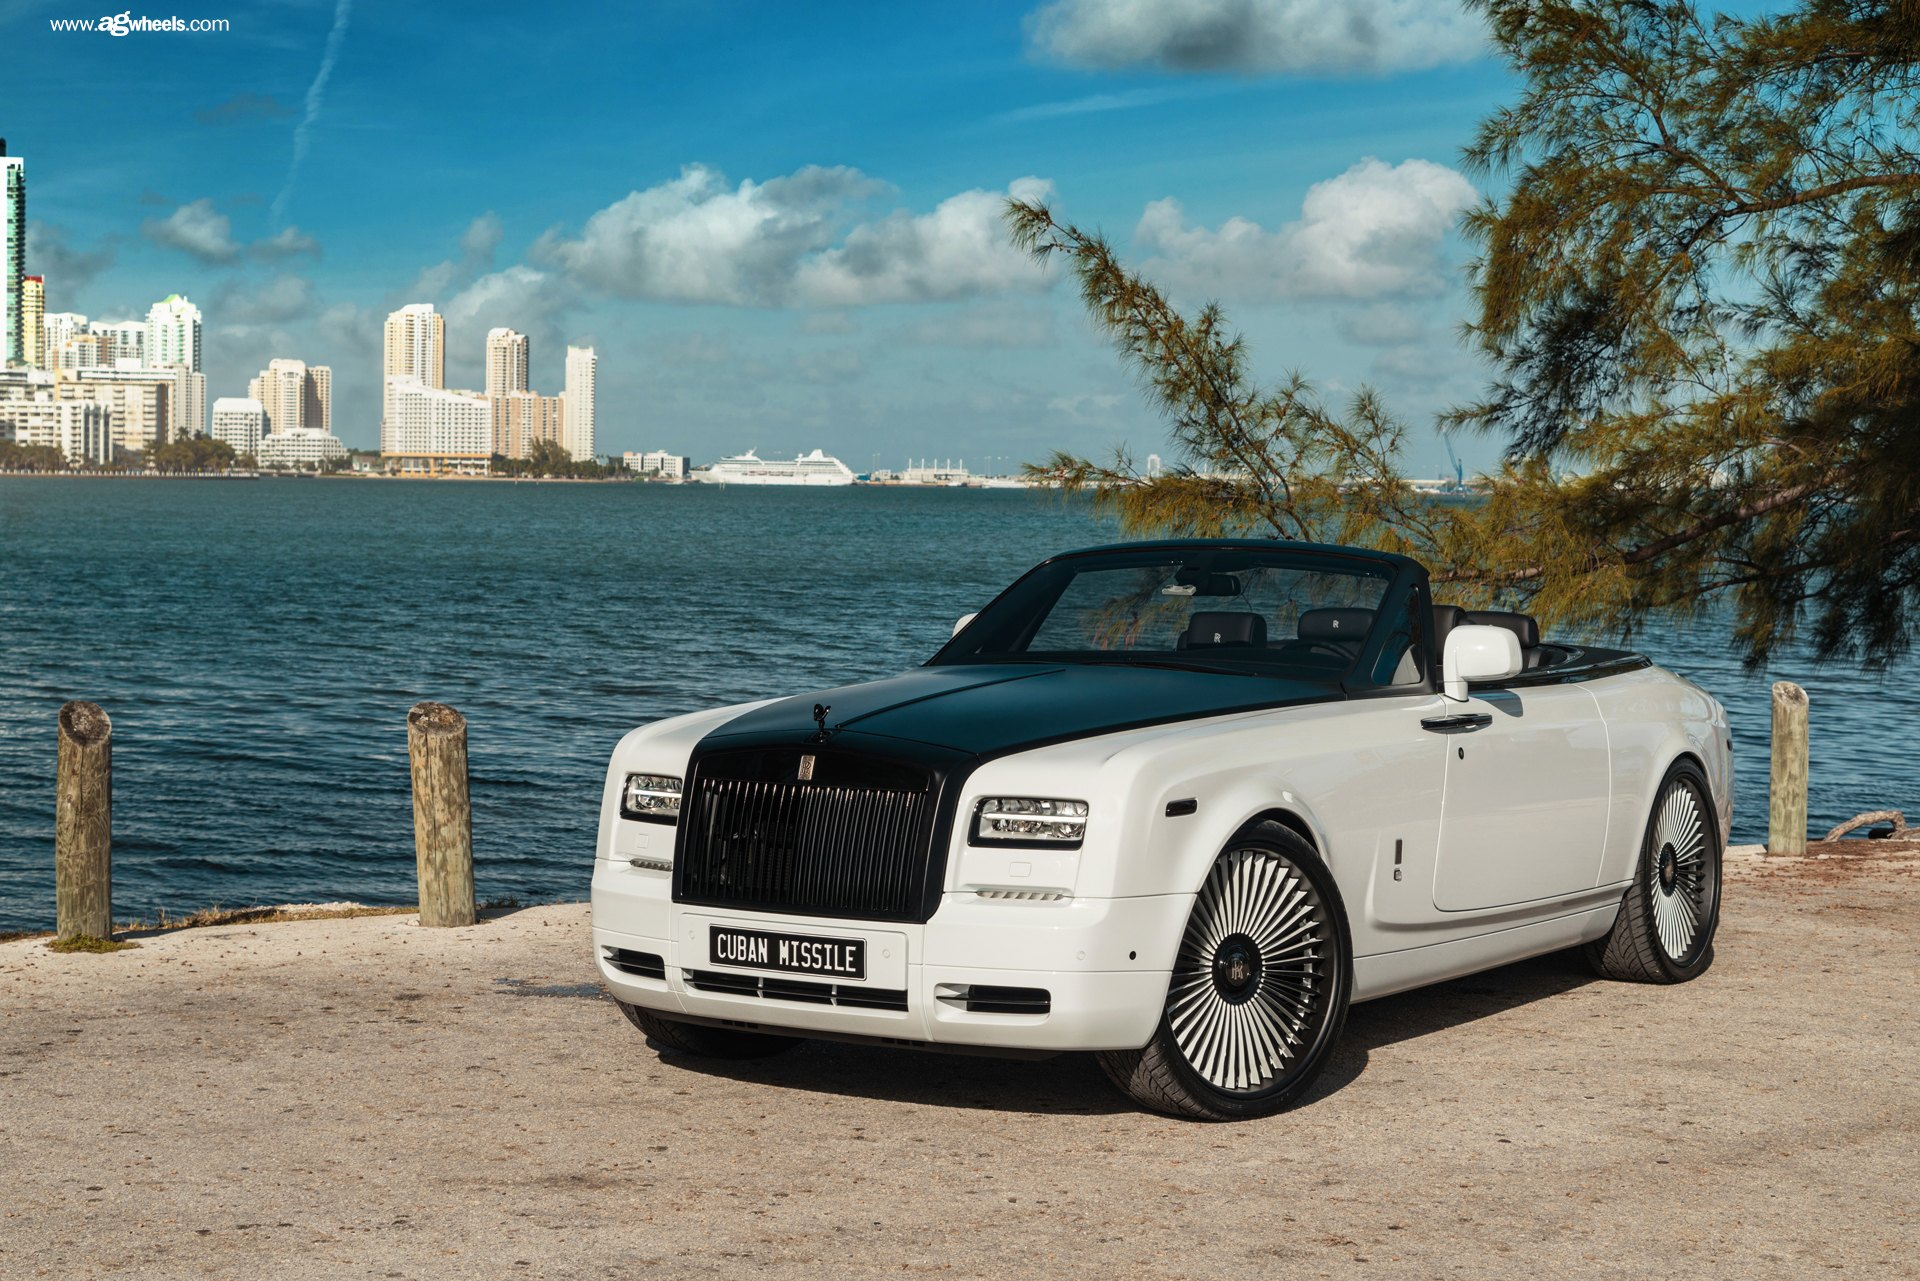 Royal Appearance Of Custom White Convertible Rolls Royce Phantom With Black Hood Carid Com Gallery